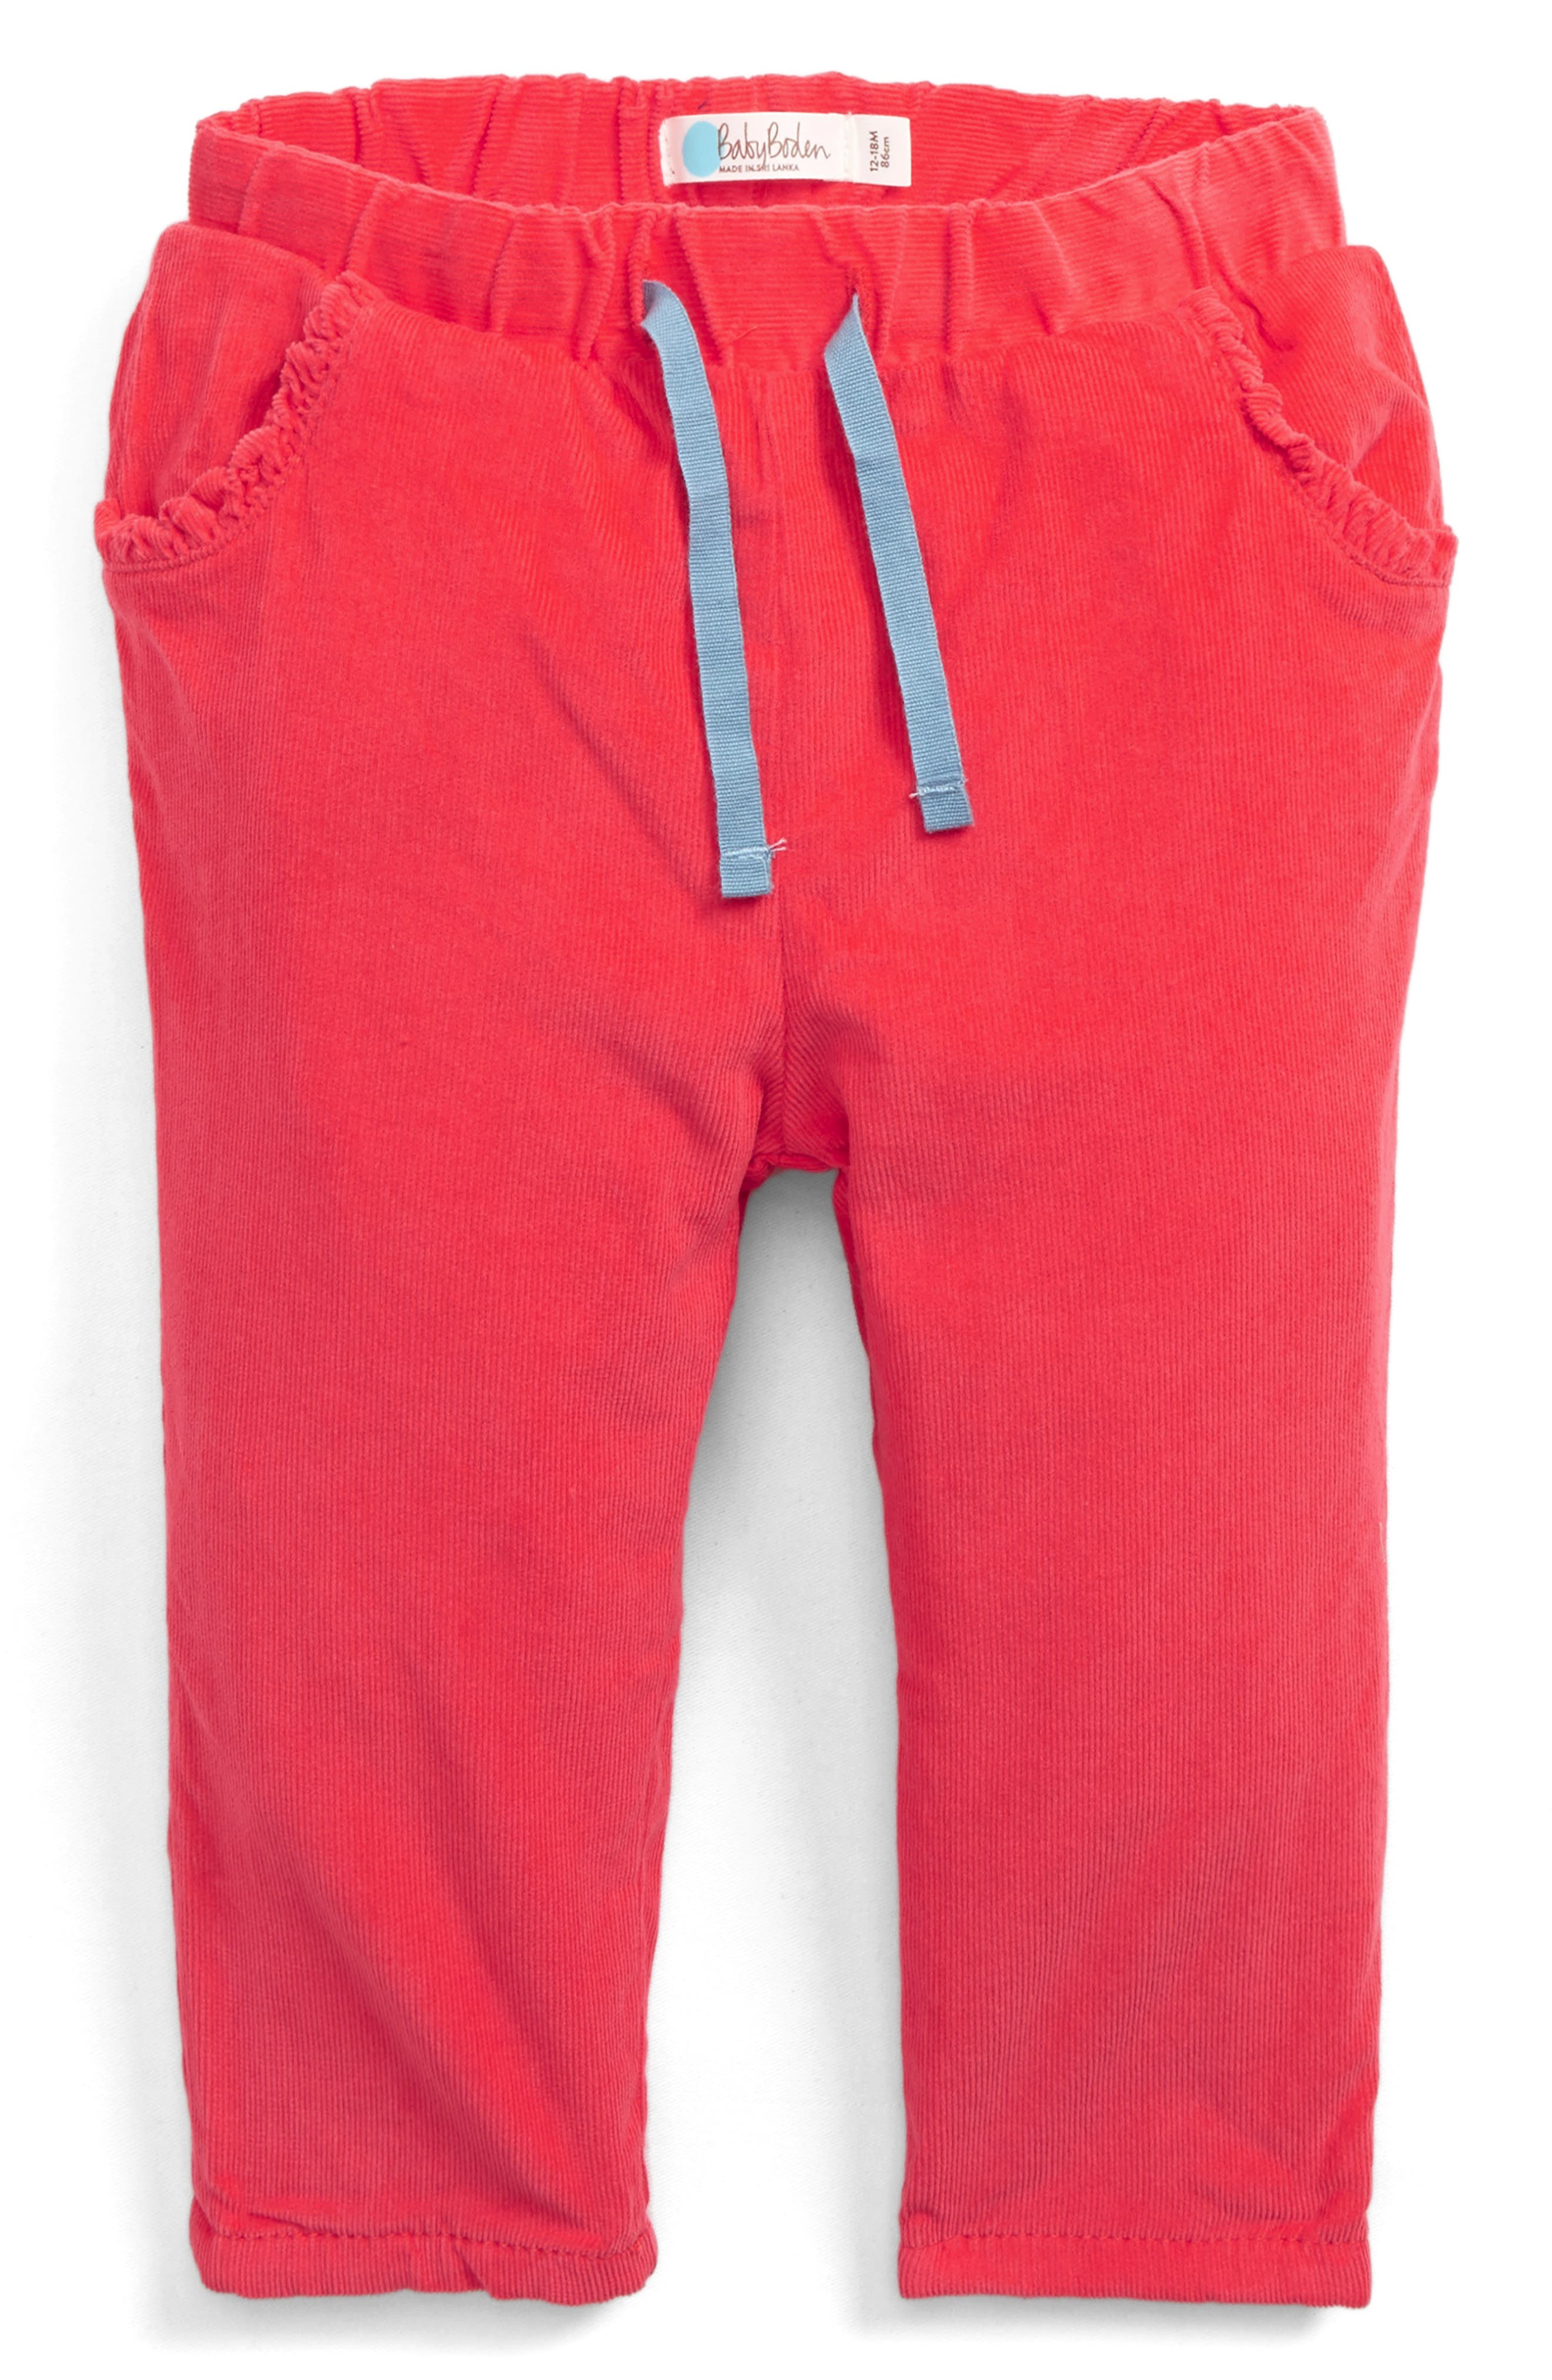 Alternate Image 1 Selected - Mini Boden Corduroy Pants (Baby Girls & Toddler Girls)